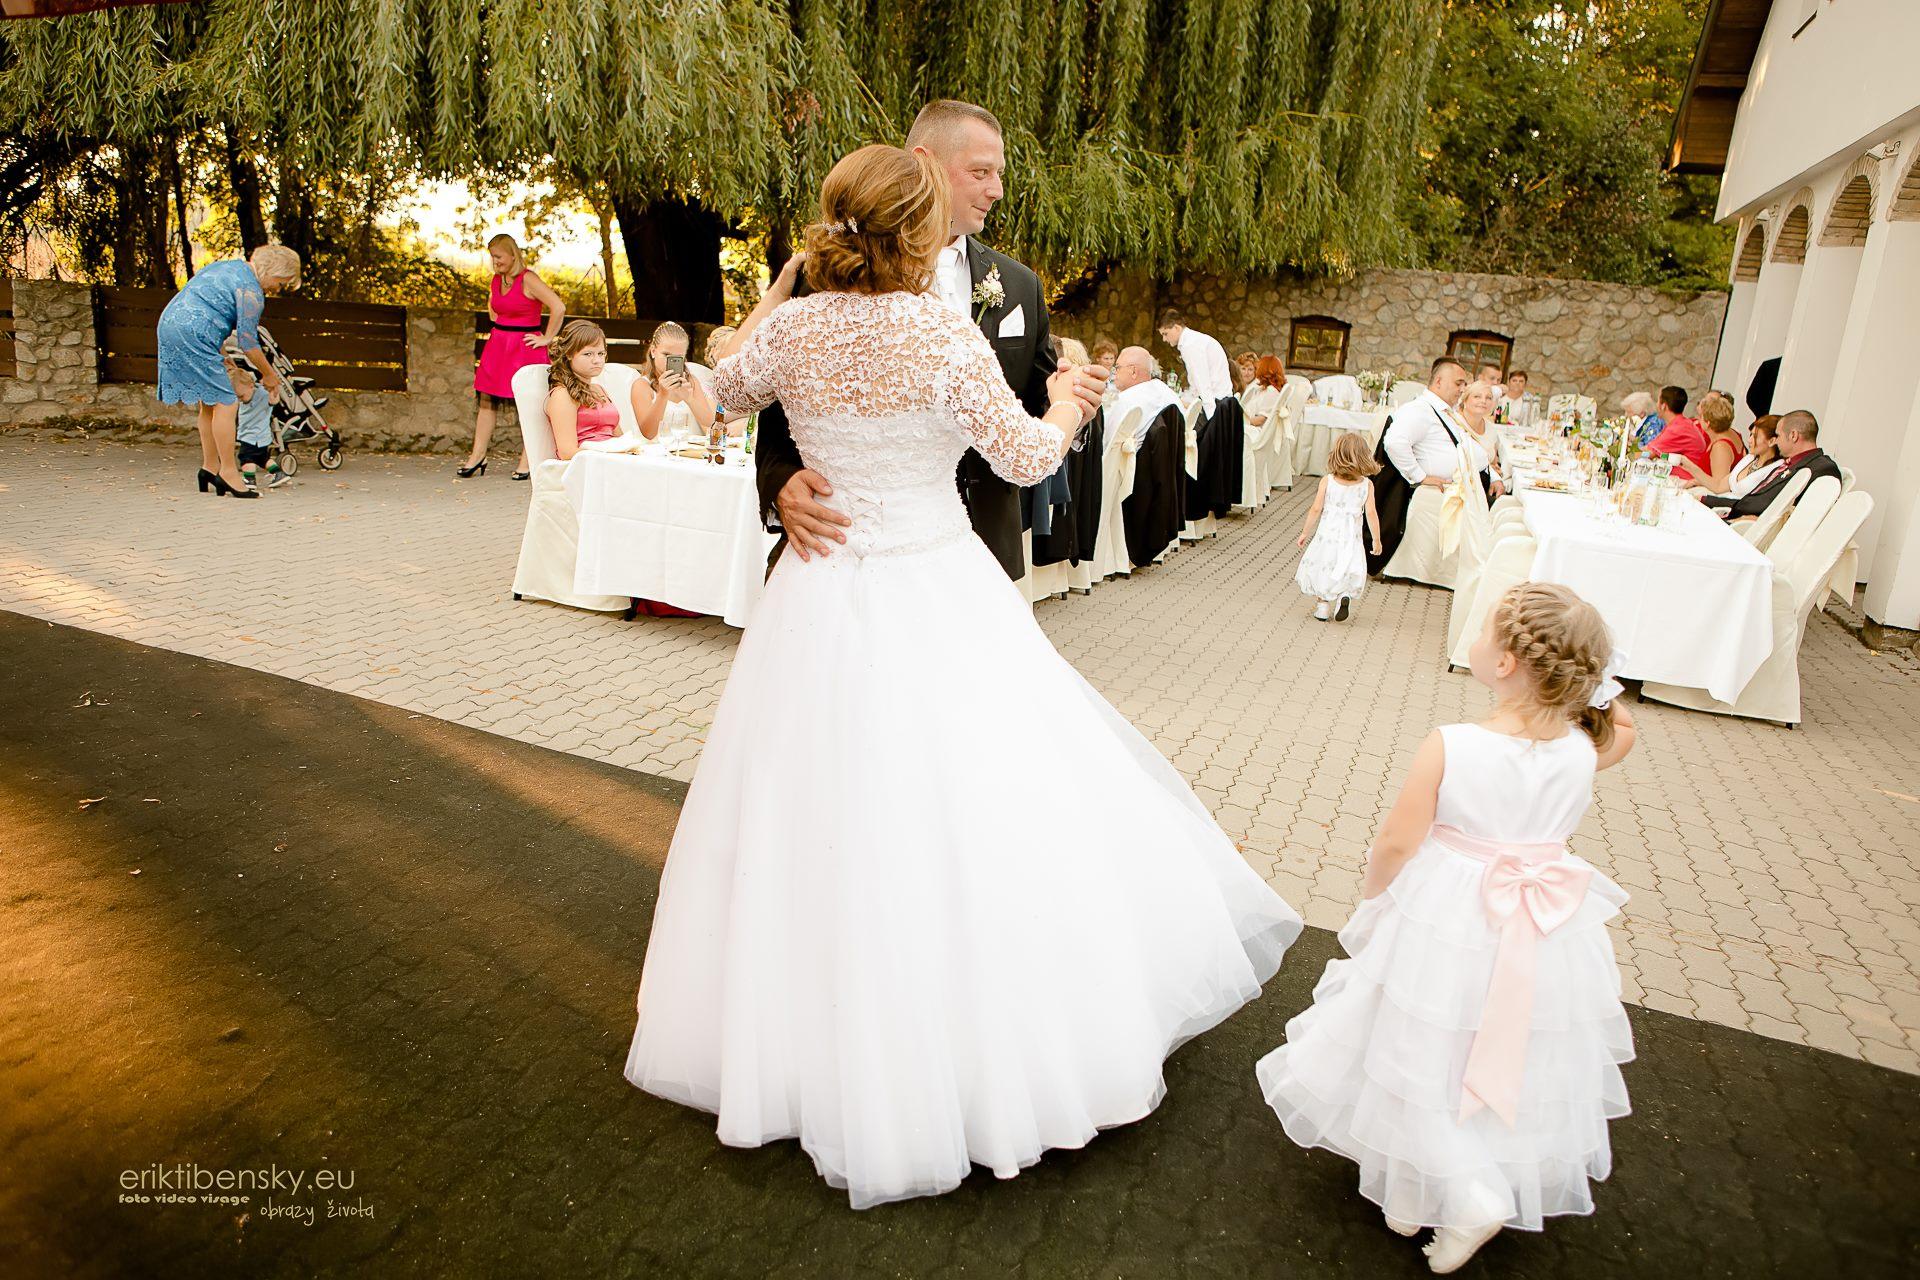 eriktibensky-eu-svadobny-fotograf-wedding-photographer-3042